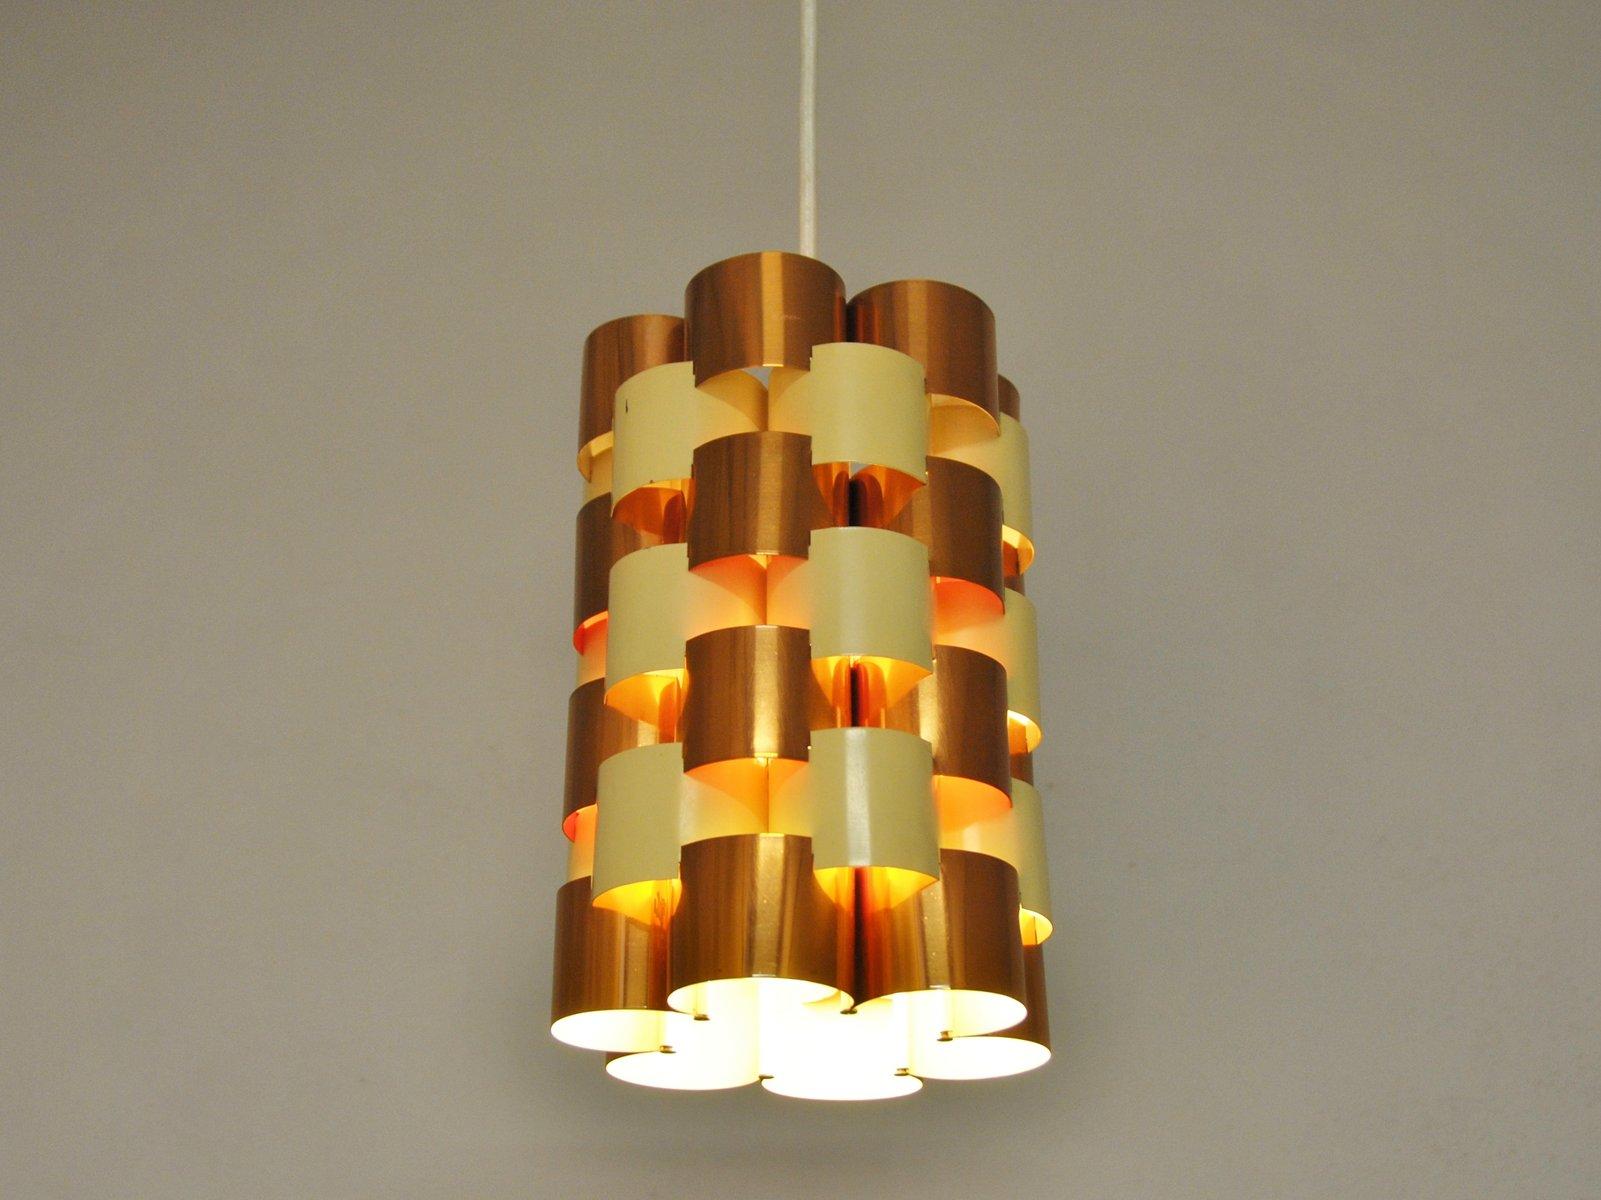 lampe suspension vintage scandinave 1960s en vente sur pamono. Black Bedroom Furniture Sets. Home Design Ideas